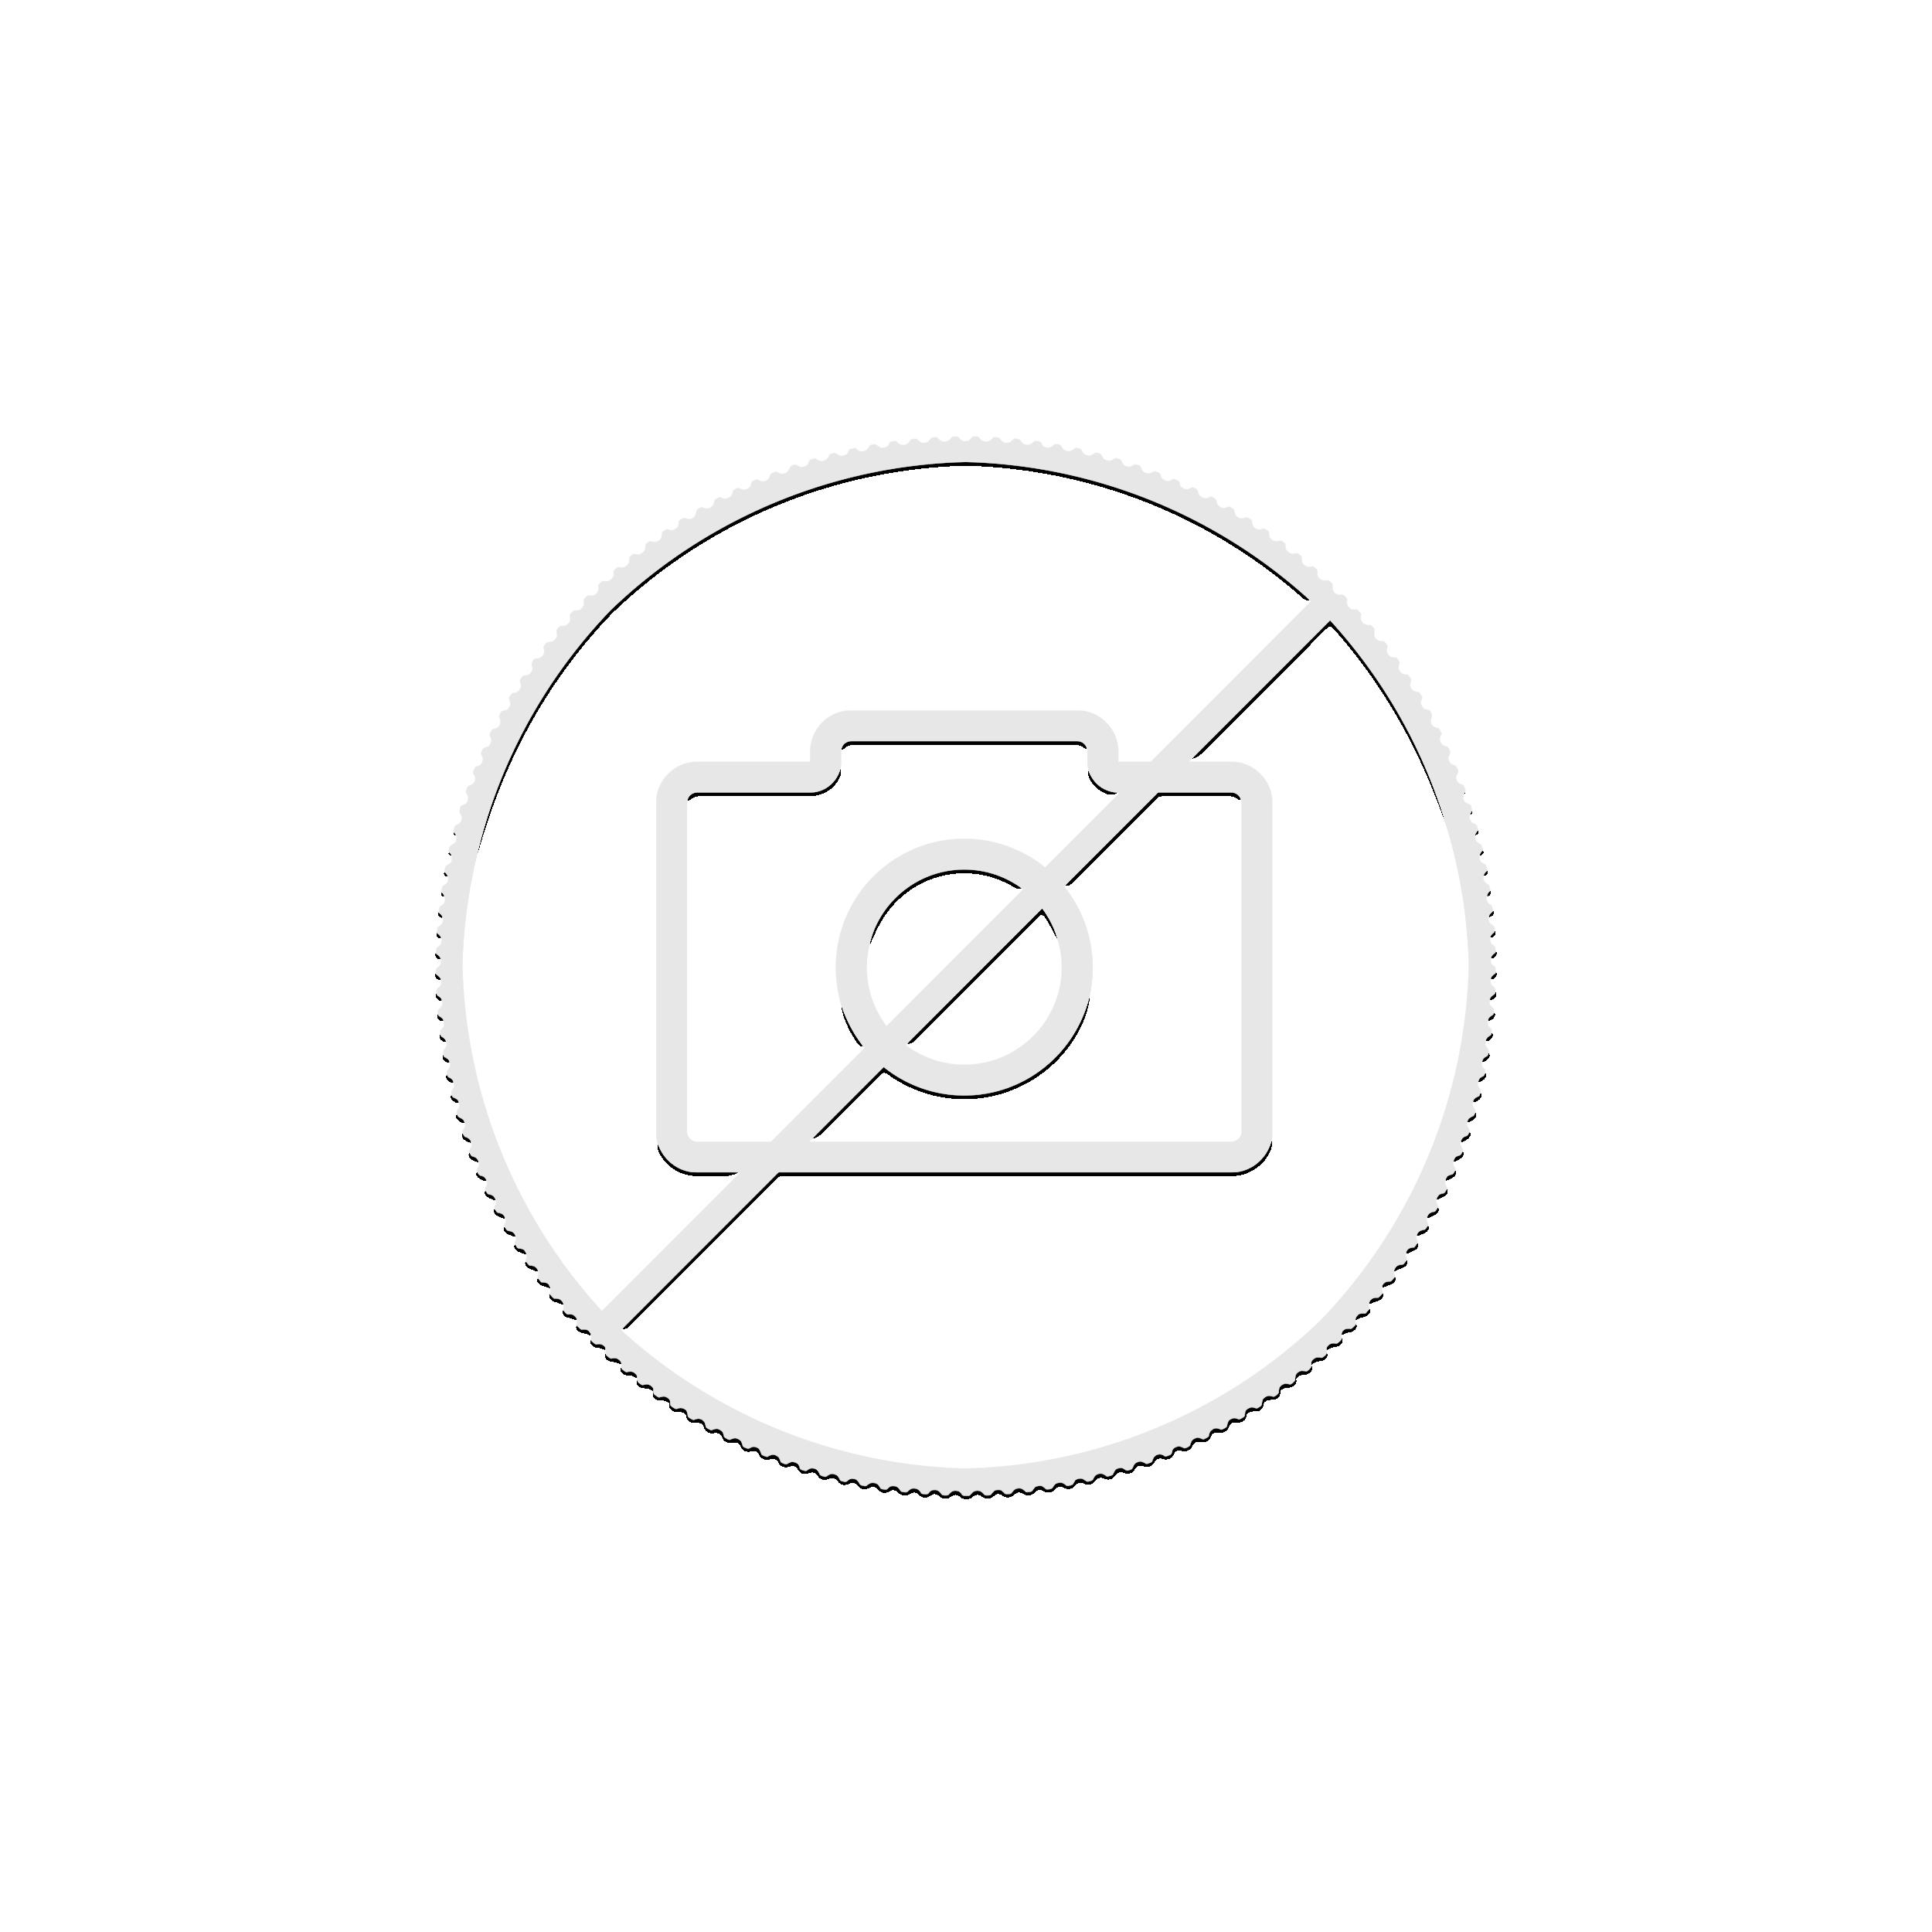 15 Gram gouden Panda munt 2018